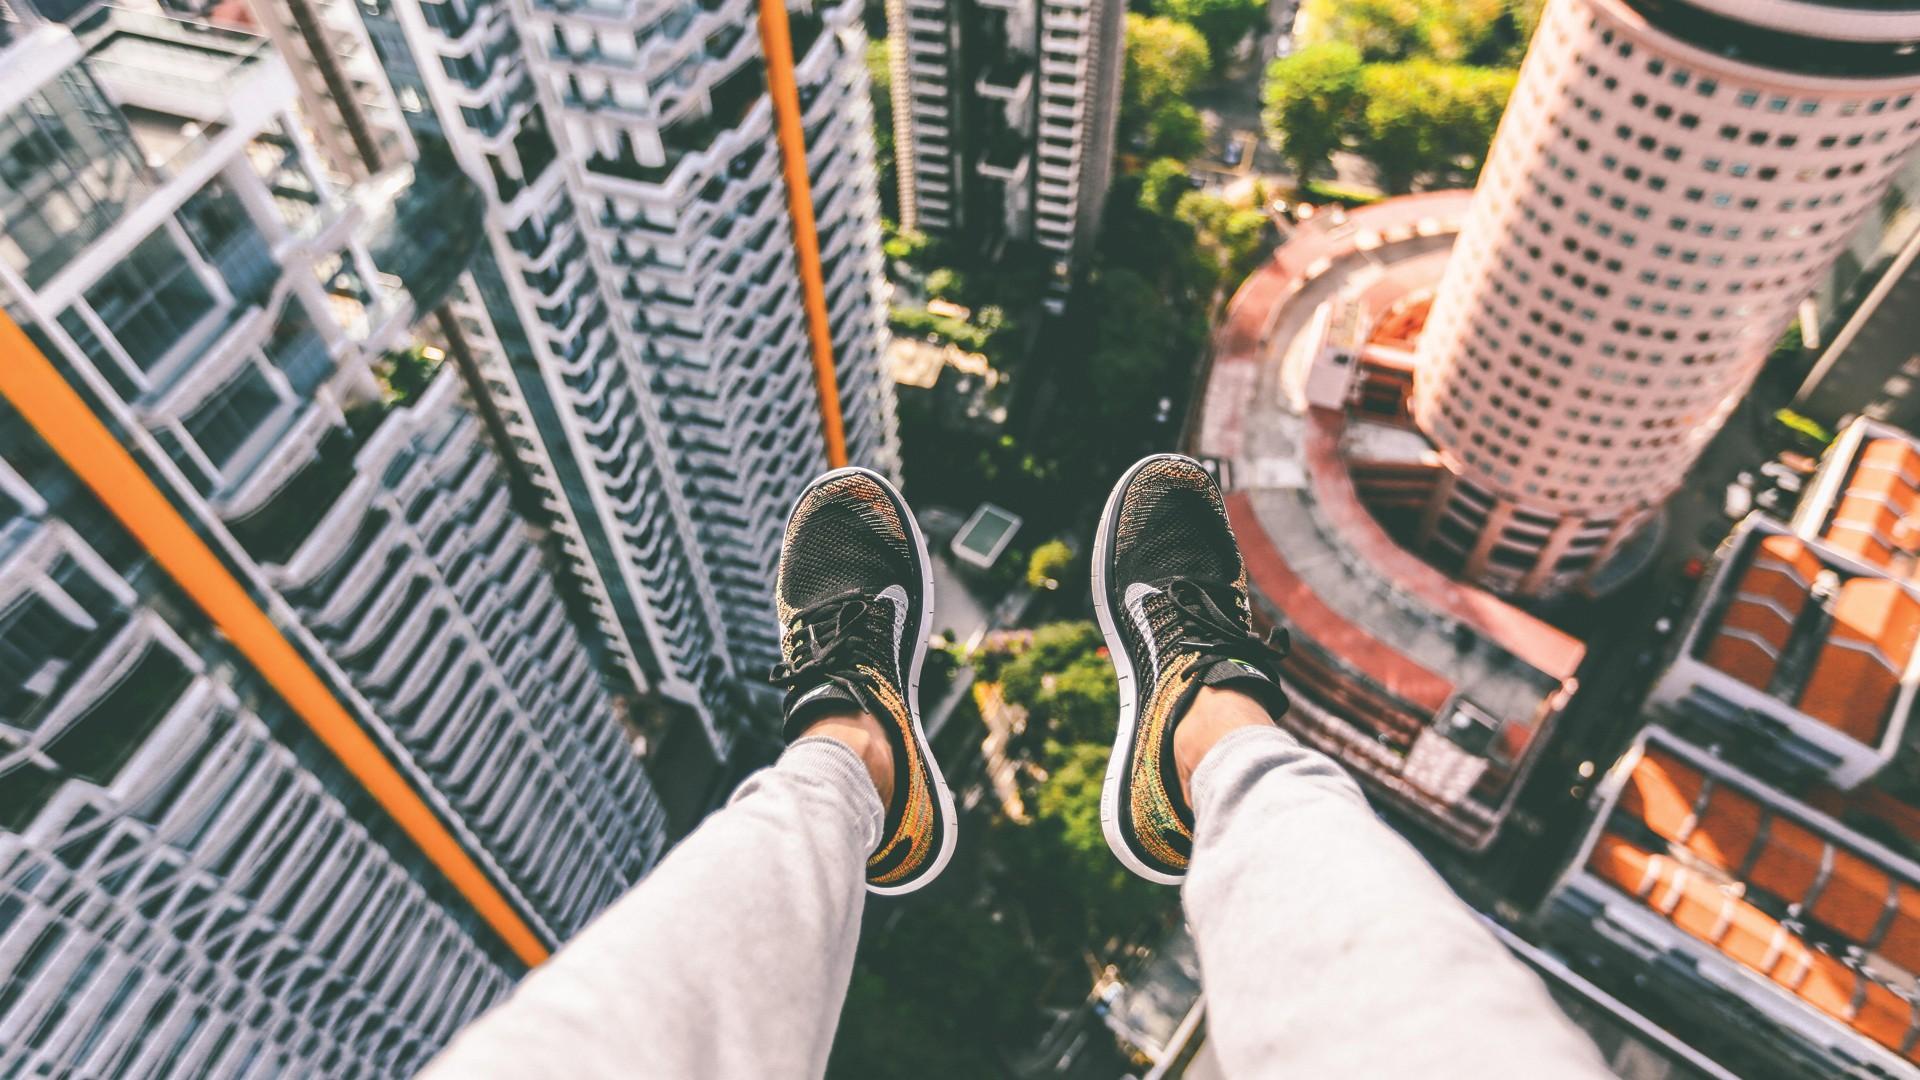 1920x1080 Px Jumping Just Do It Nike Parkour Skywalk